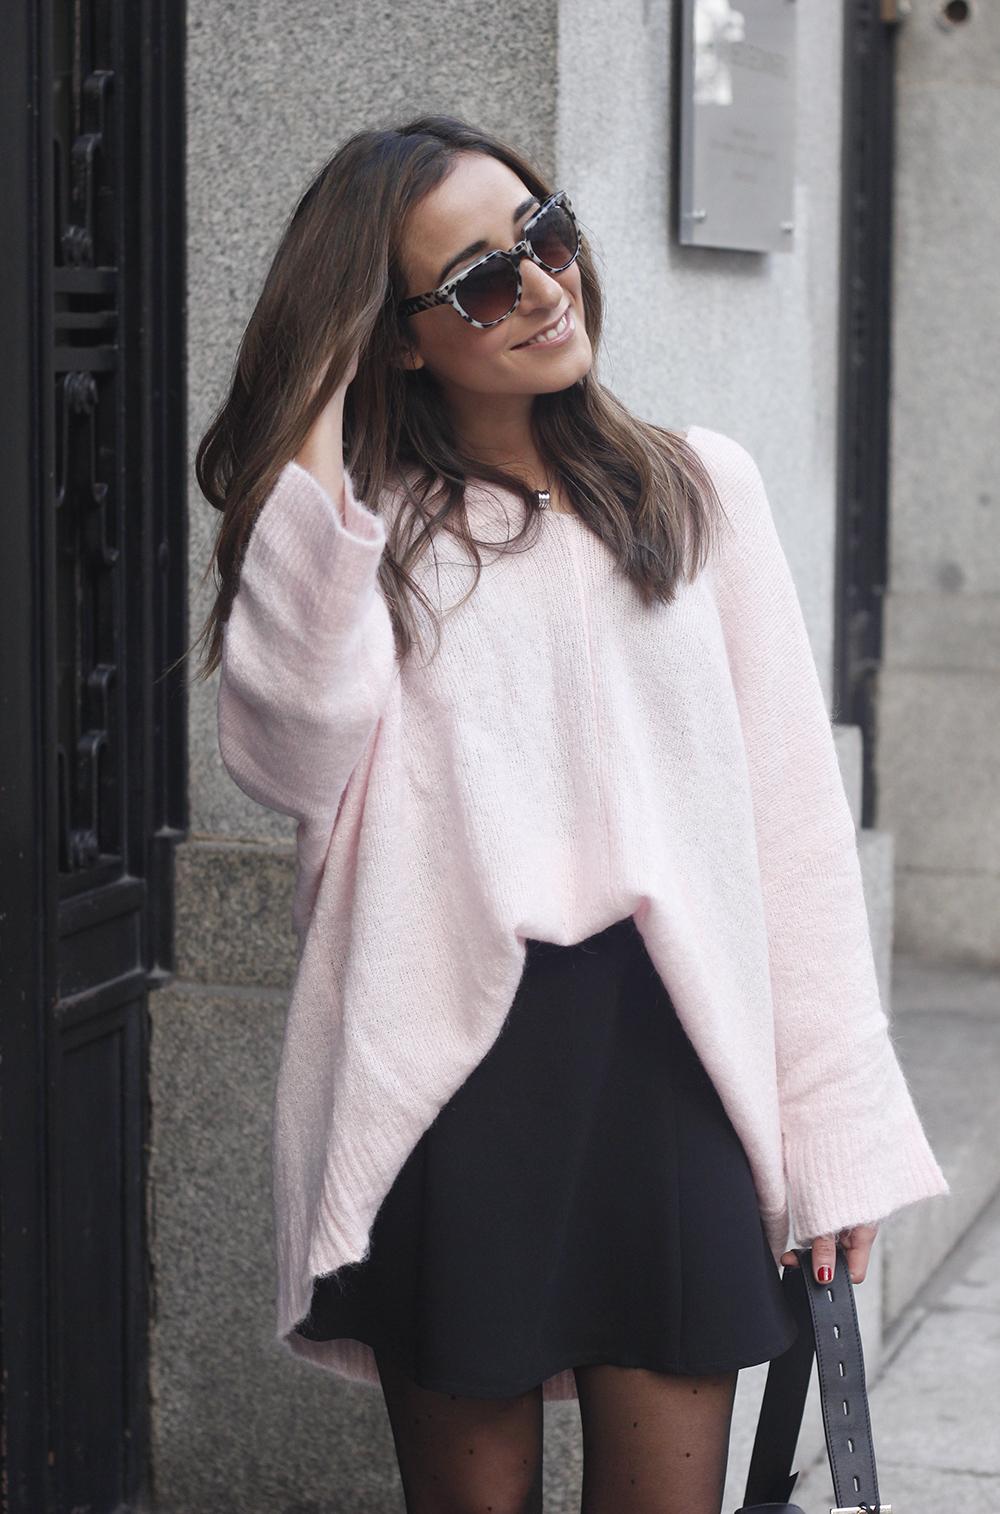 Pink sweater black skirt bulgari ring gloria ortiz bag heels outfit styel fashion09